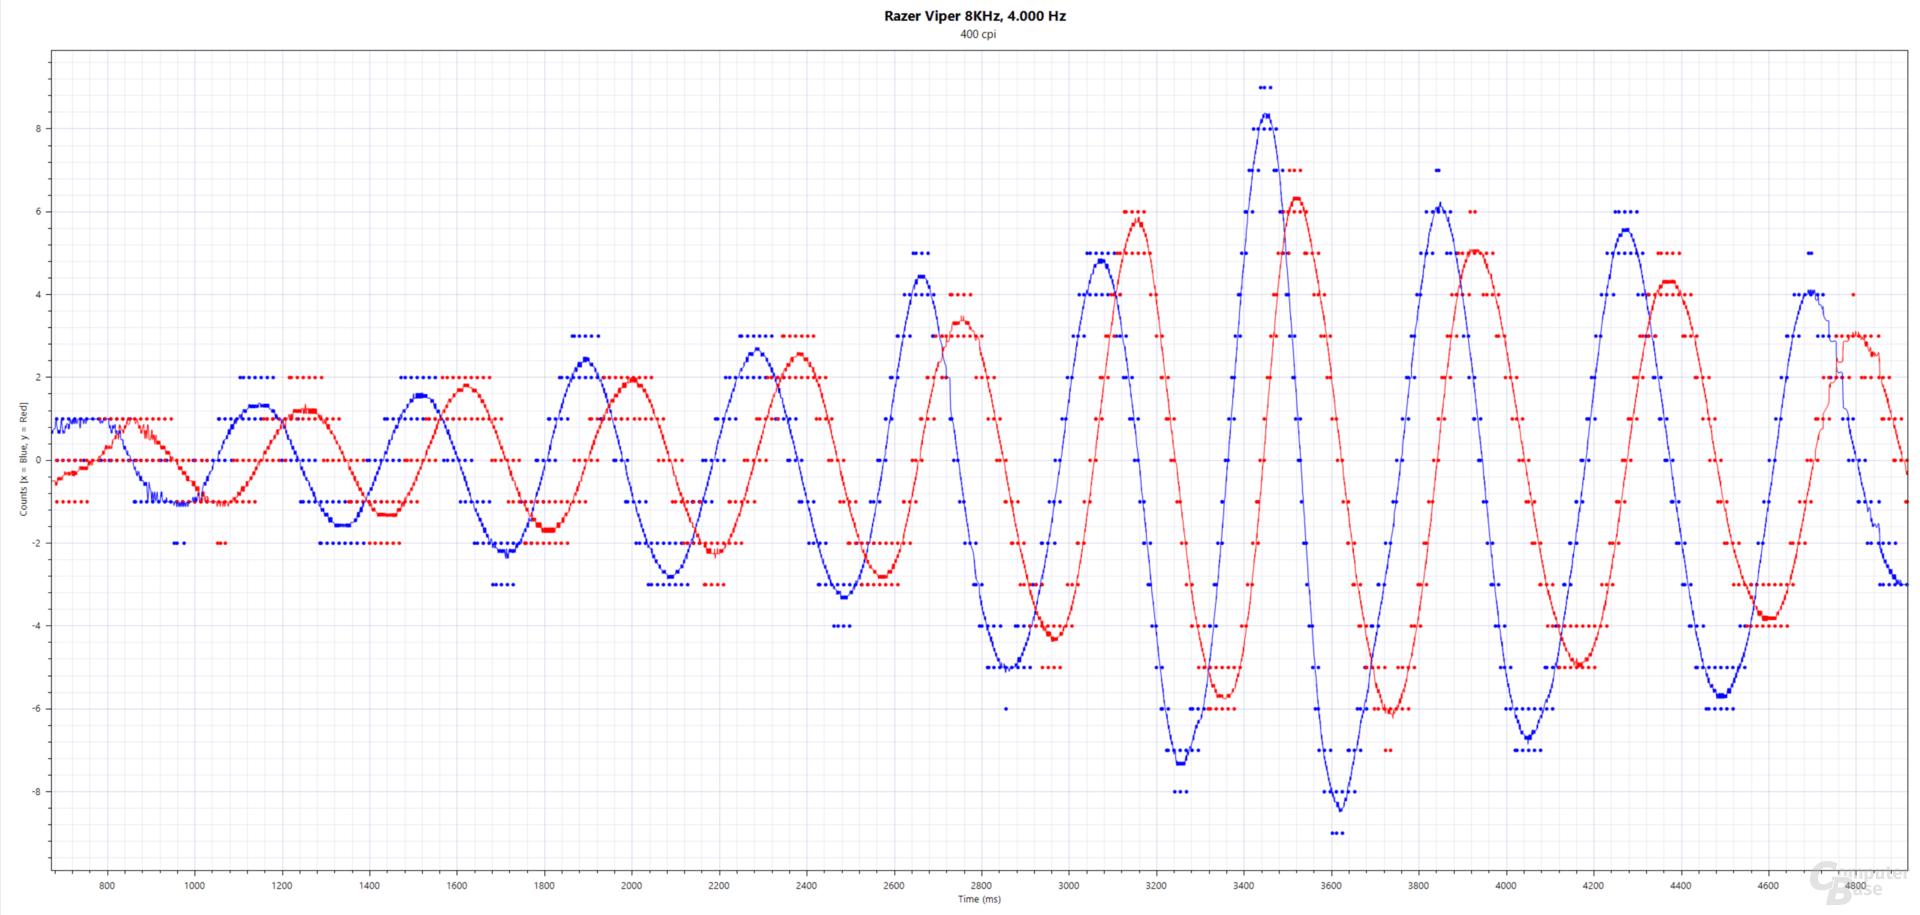 Blau: xCounts(ms), Rot: yCounts(ms); Razer Viper 8KHz (PMW-3399, 400 cpi, 4.000 Hertz, Stoffmauspad)